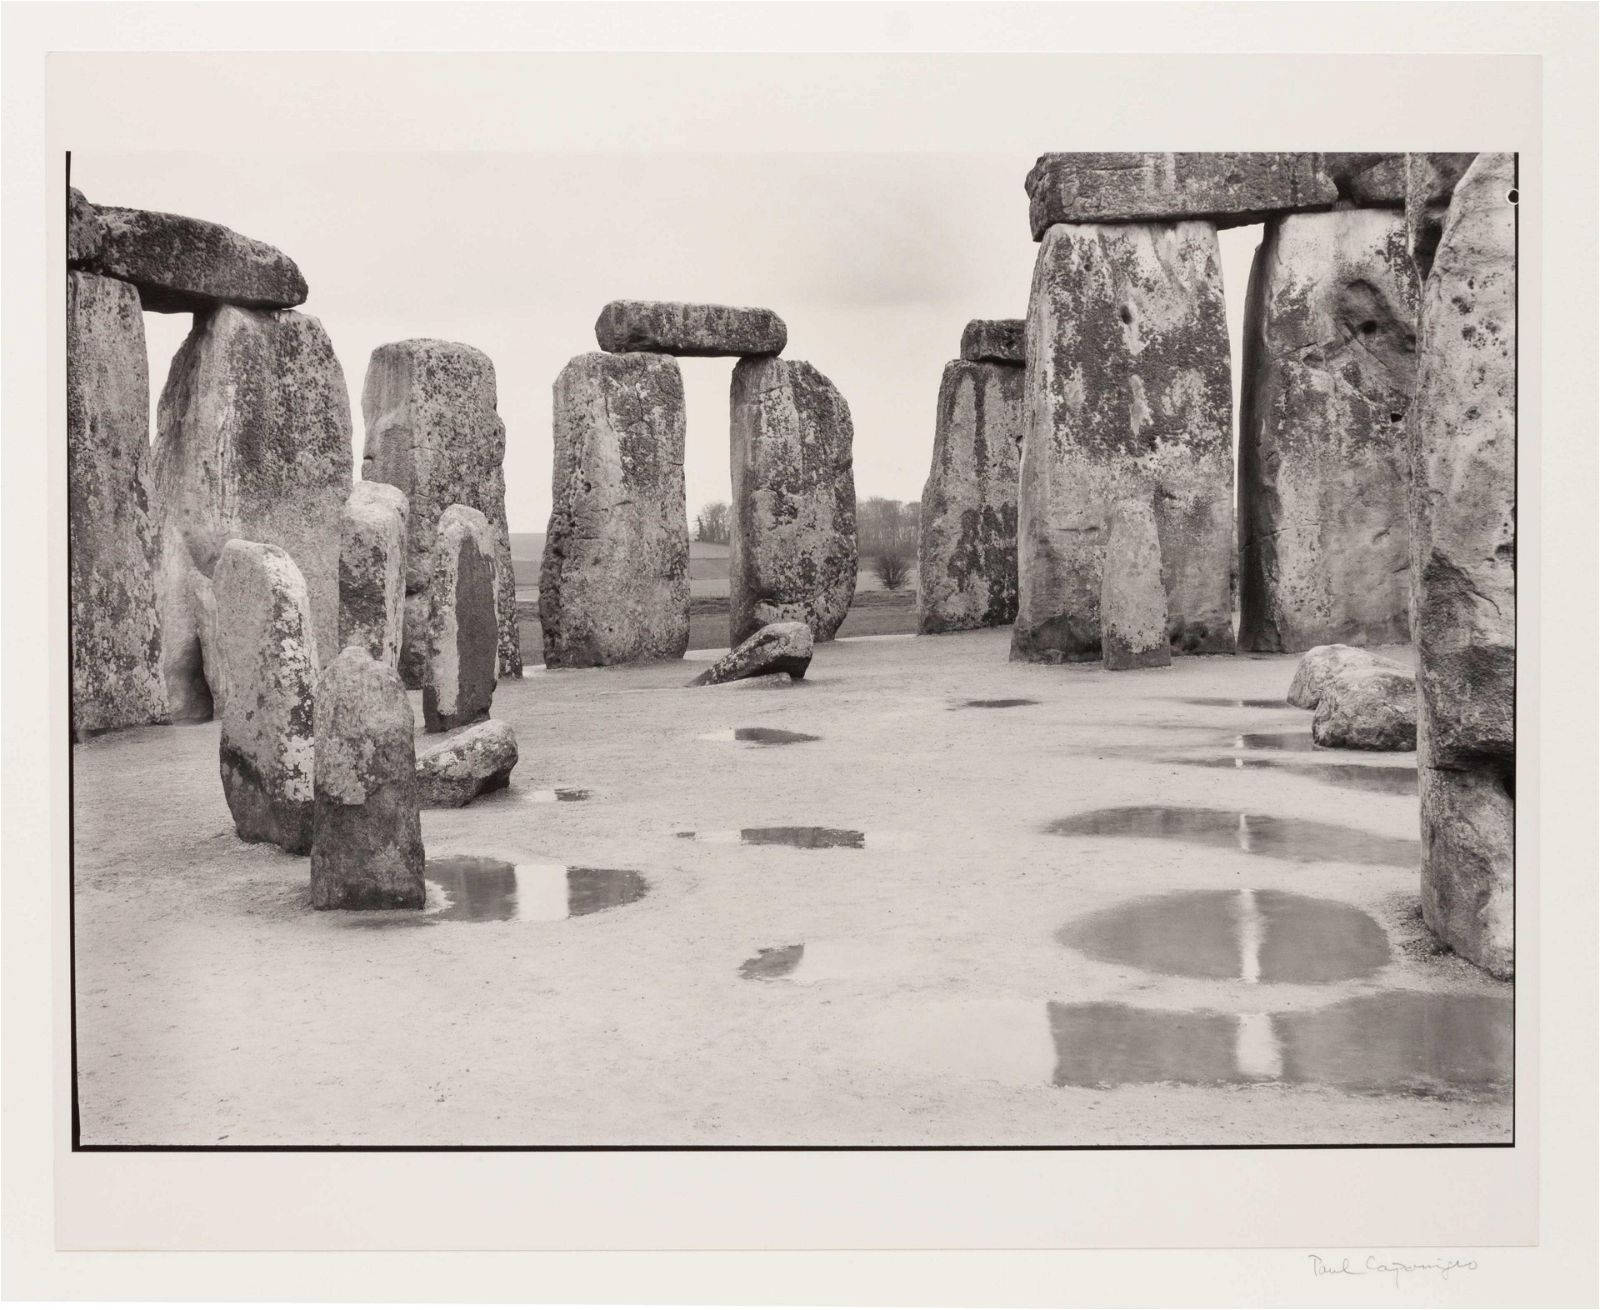 Paul Caponigro (American, b. 1932) Untitled